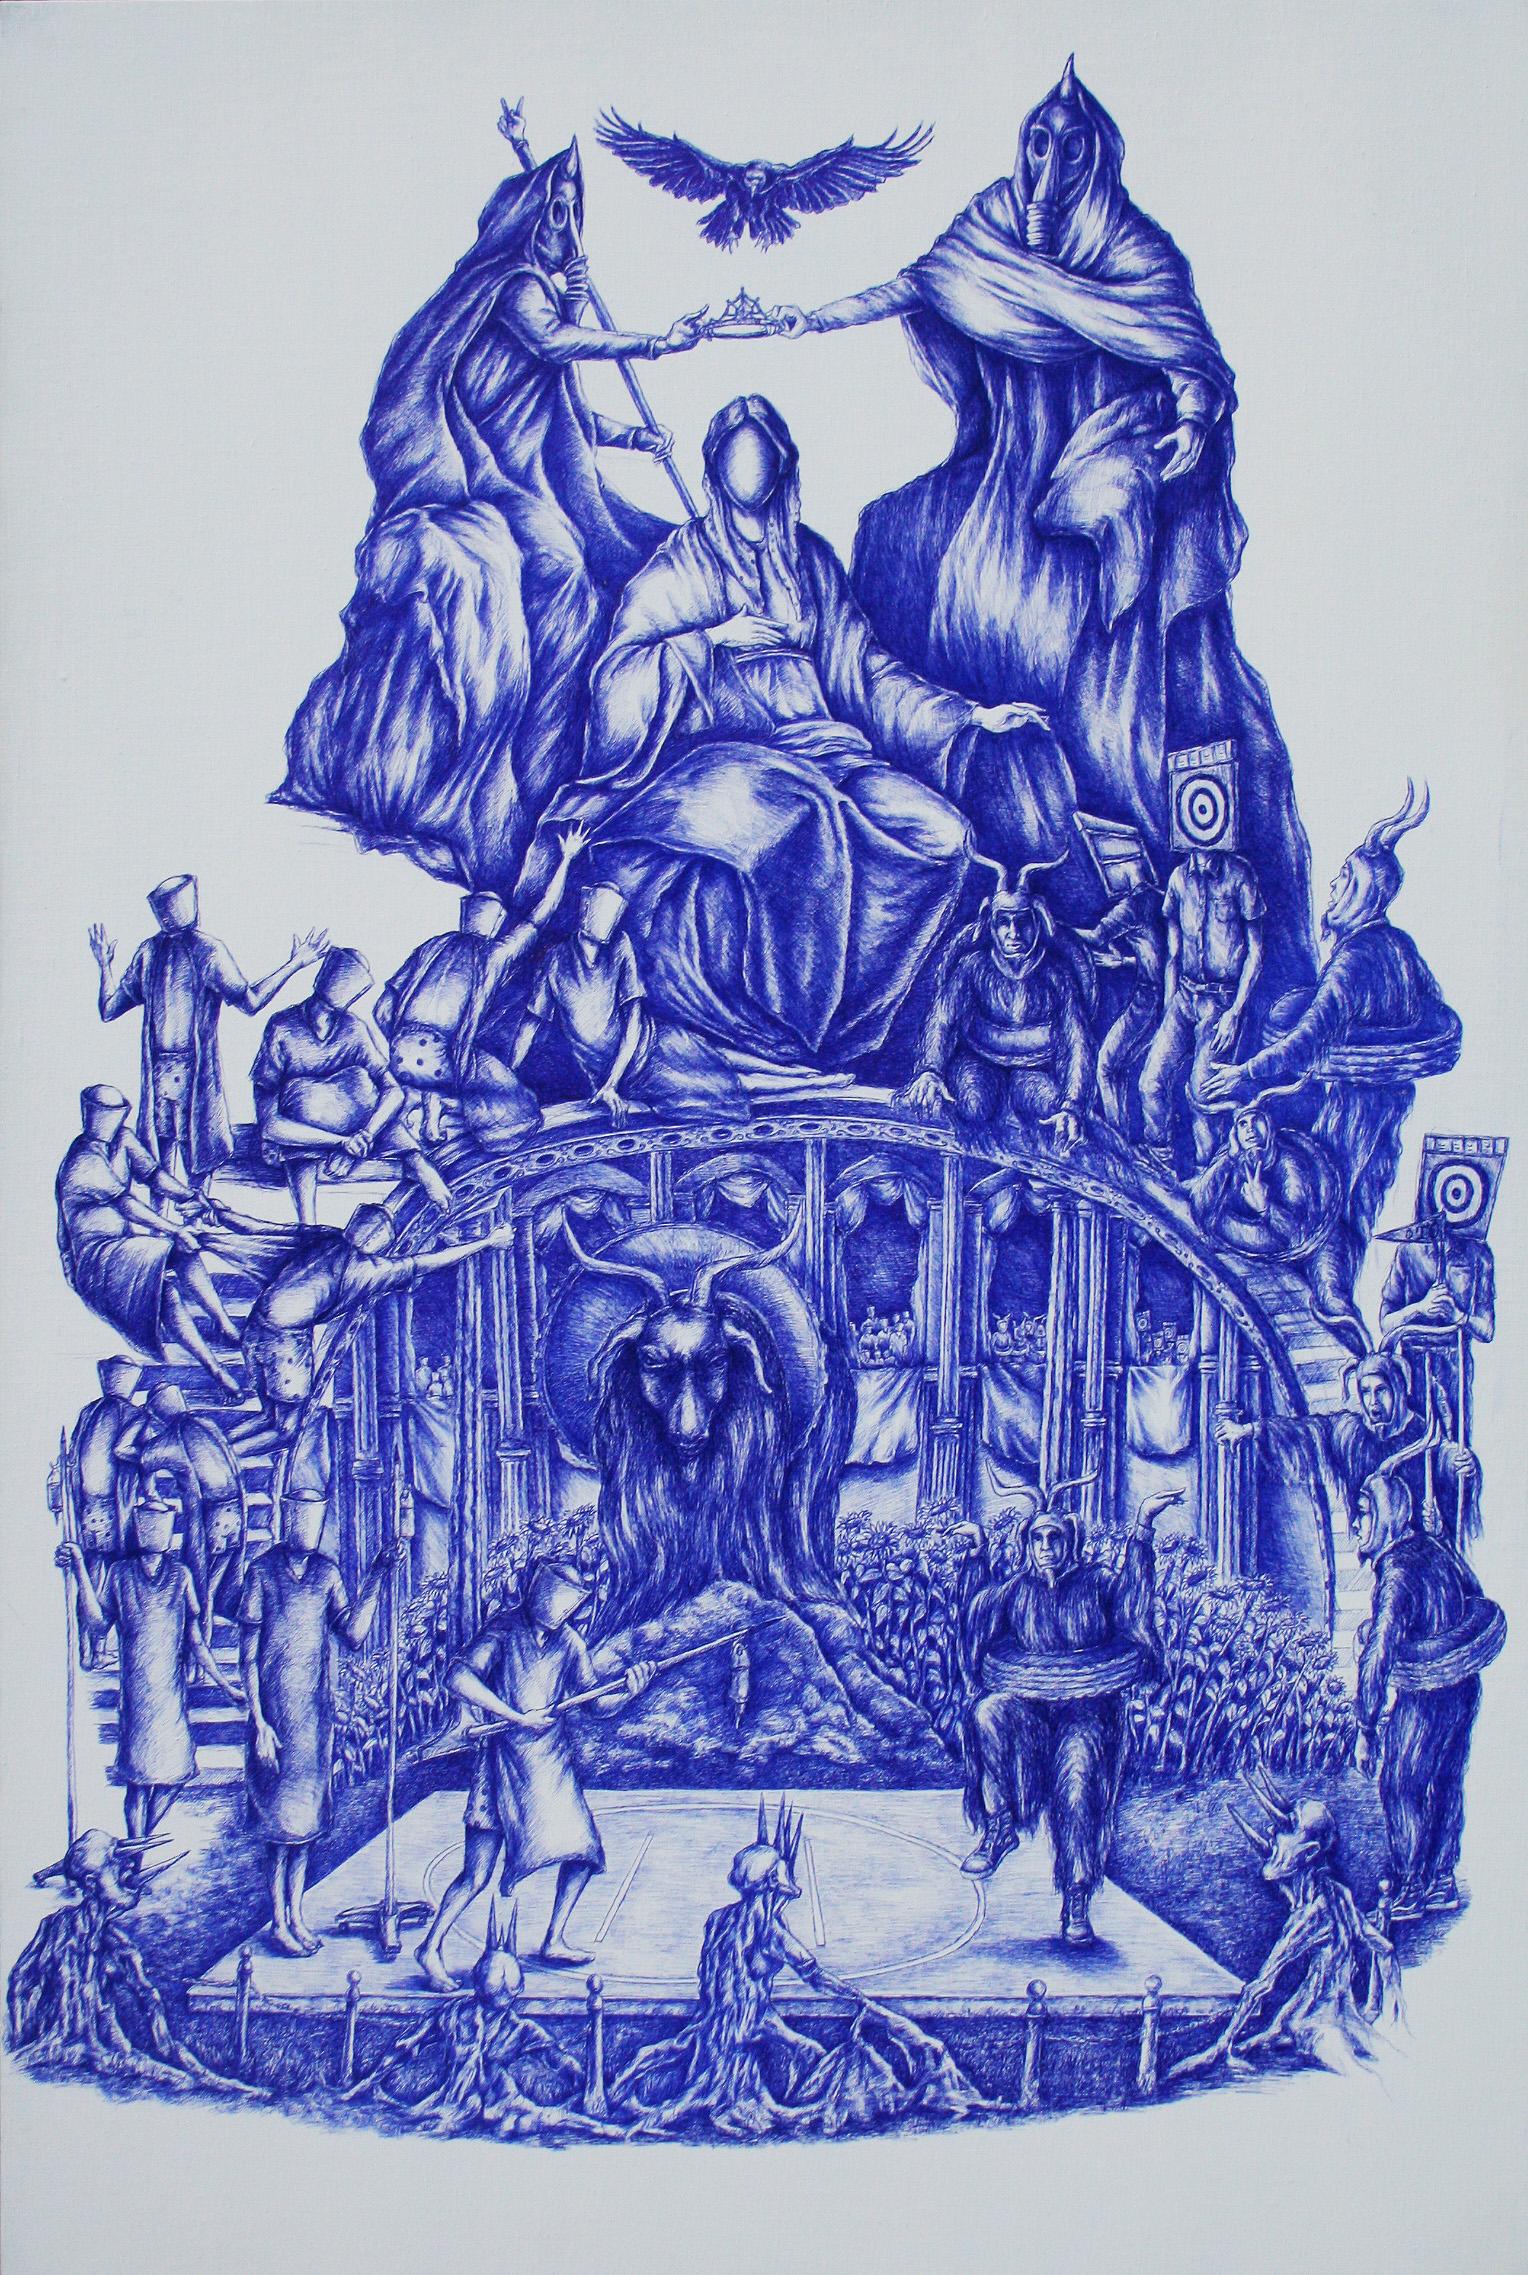 Coronation of the Faceless